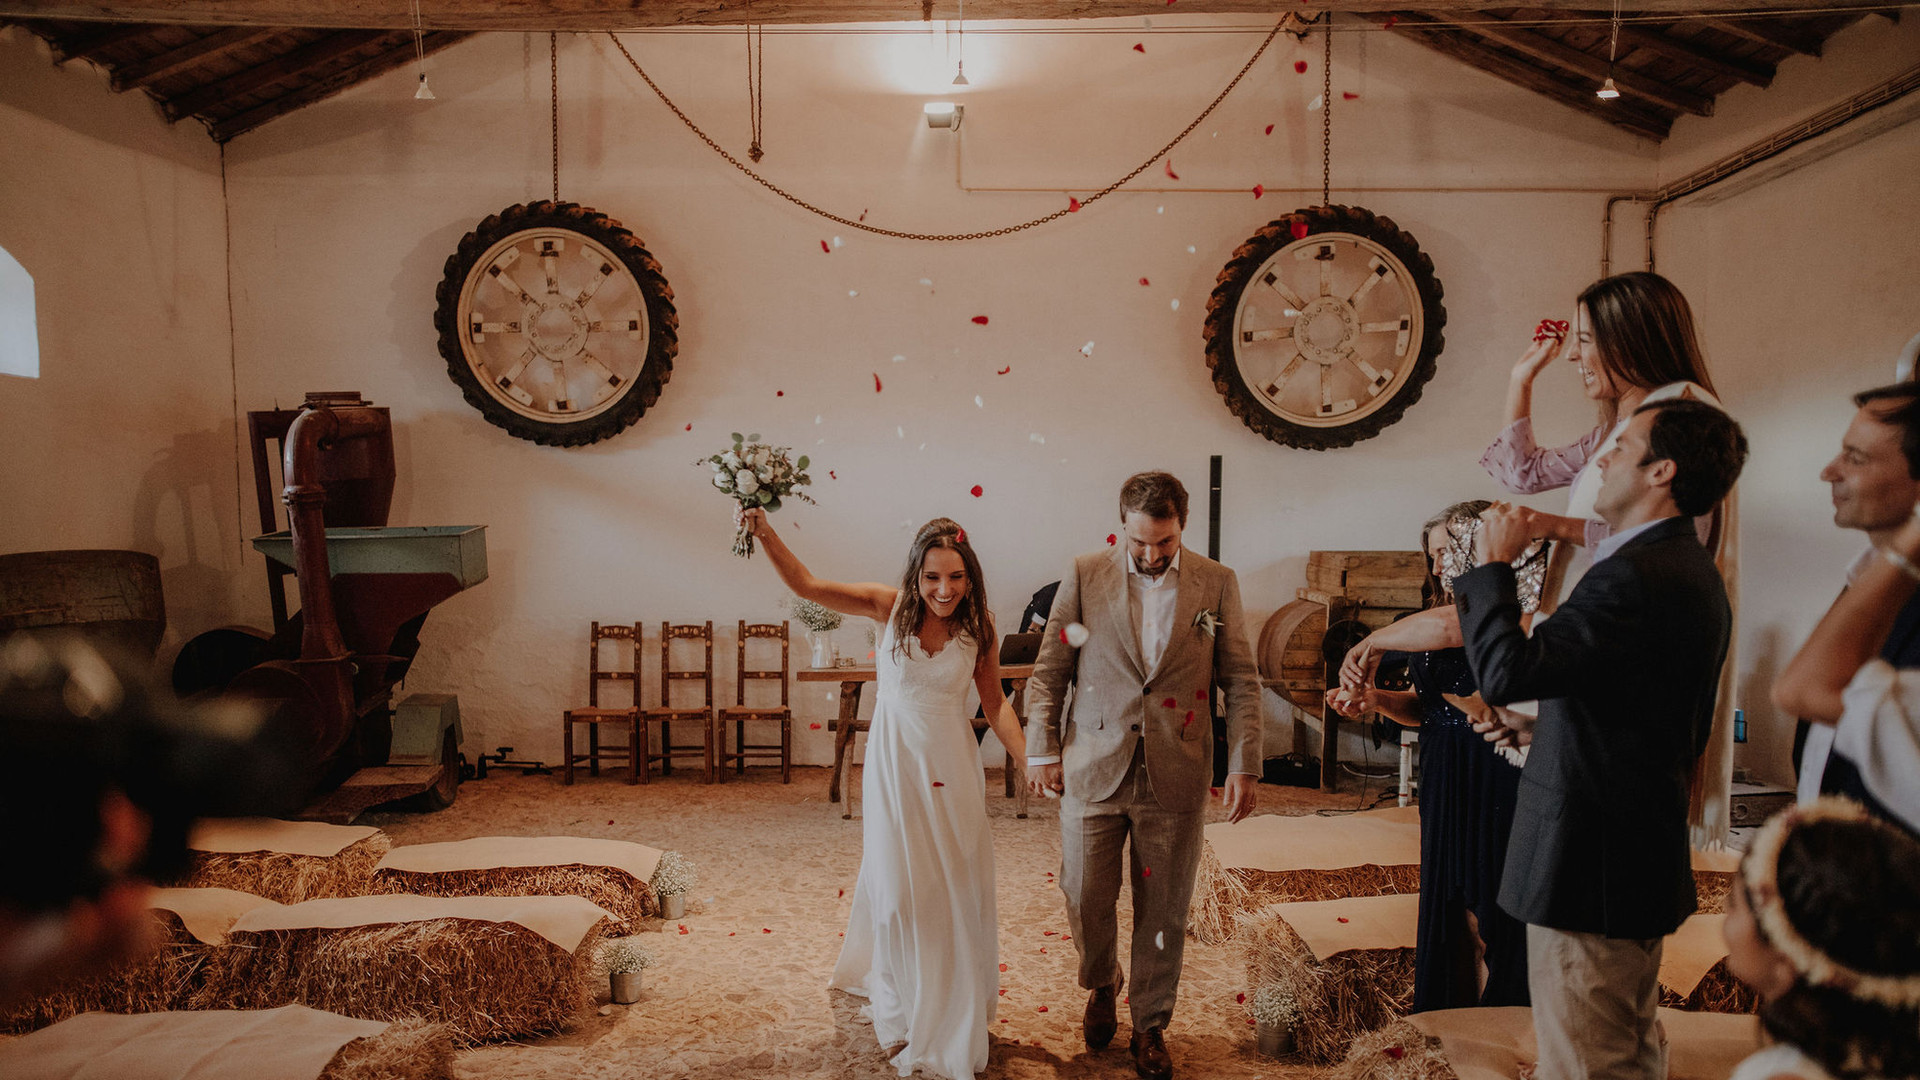 Indoor ceremony in barn style